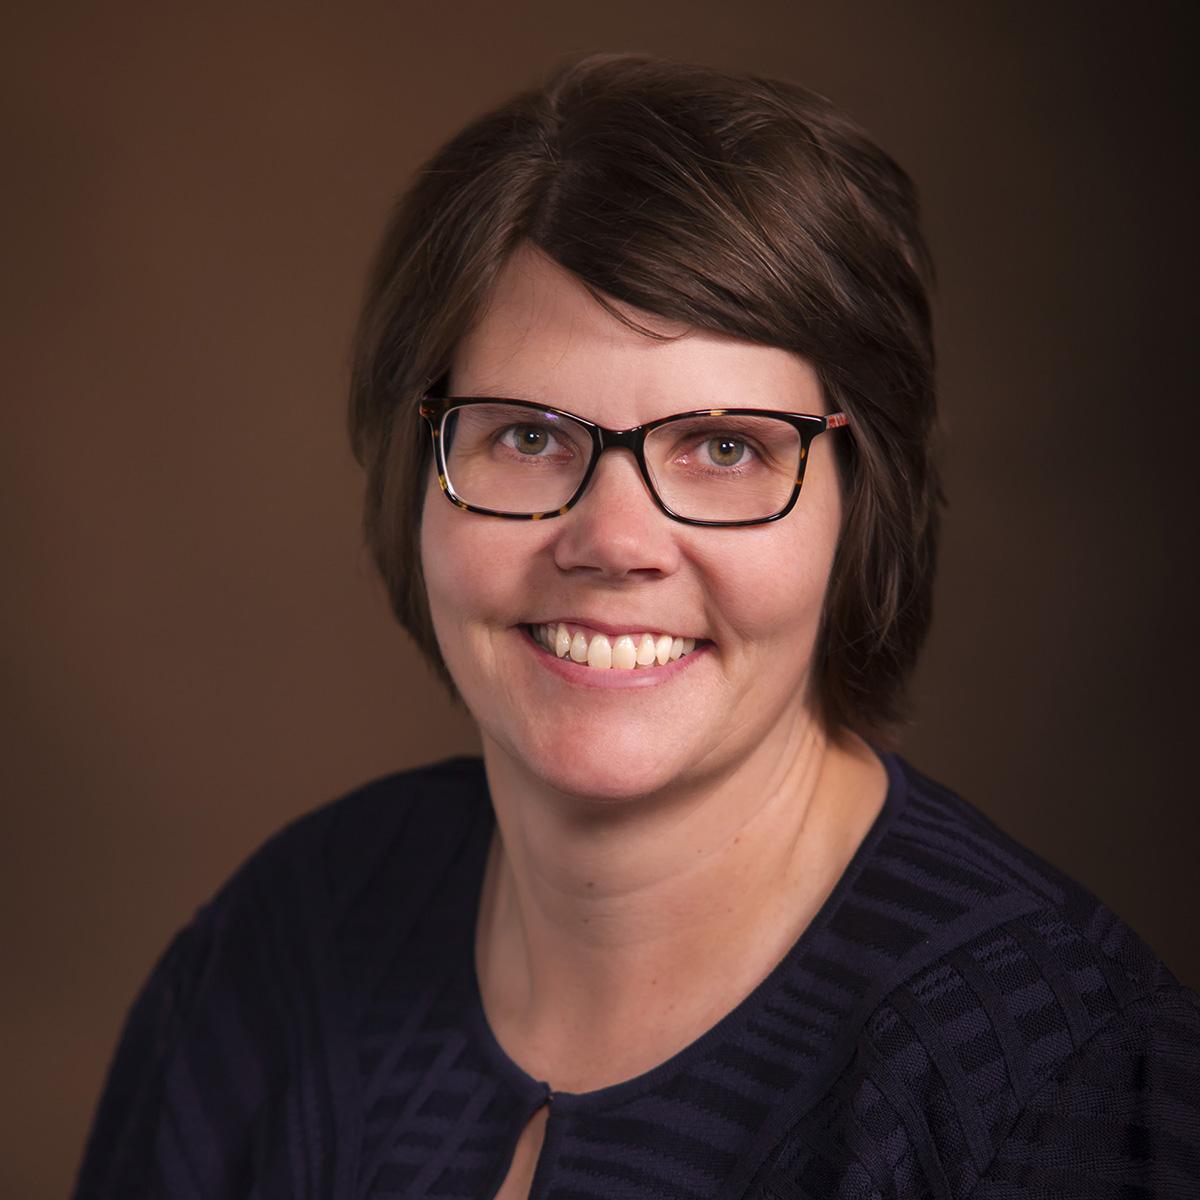 Profile picture of Deb VanOverbeke